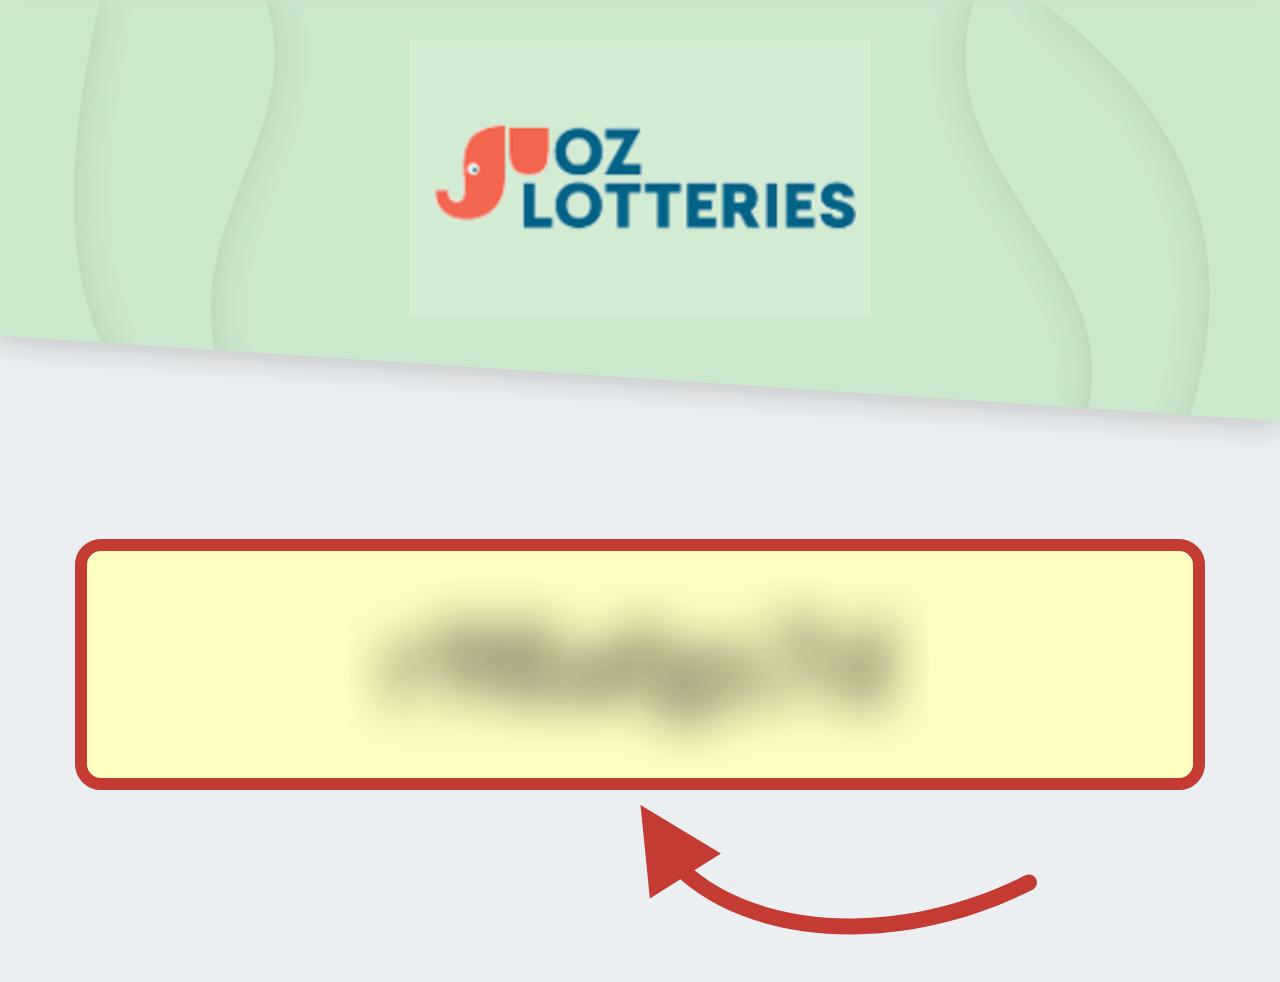 OZ Lotteries Promo Code